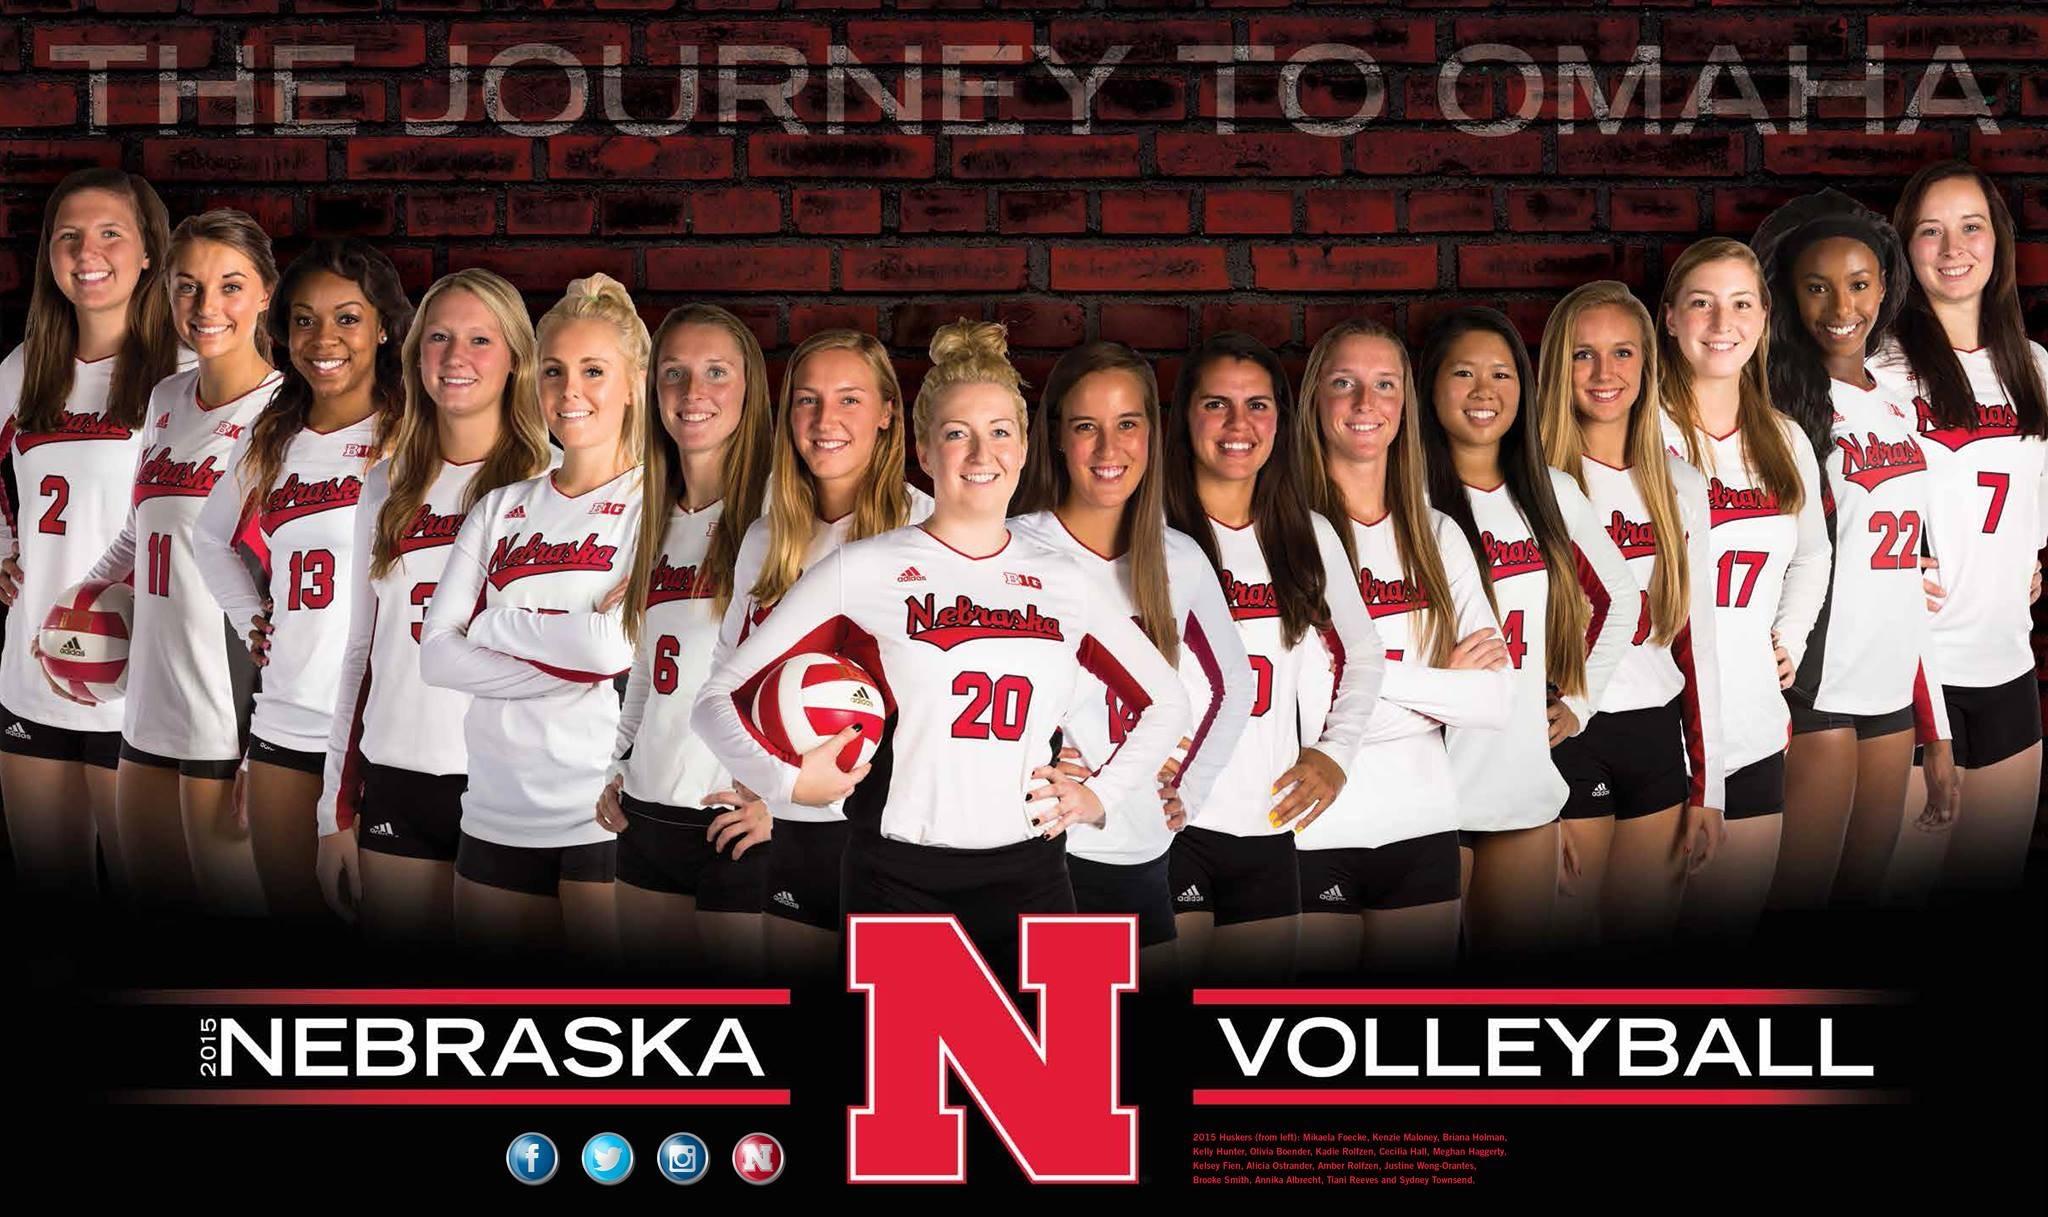 University of Nebraska Volleyball 2015